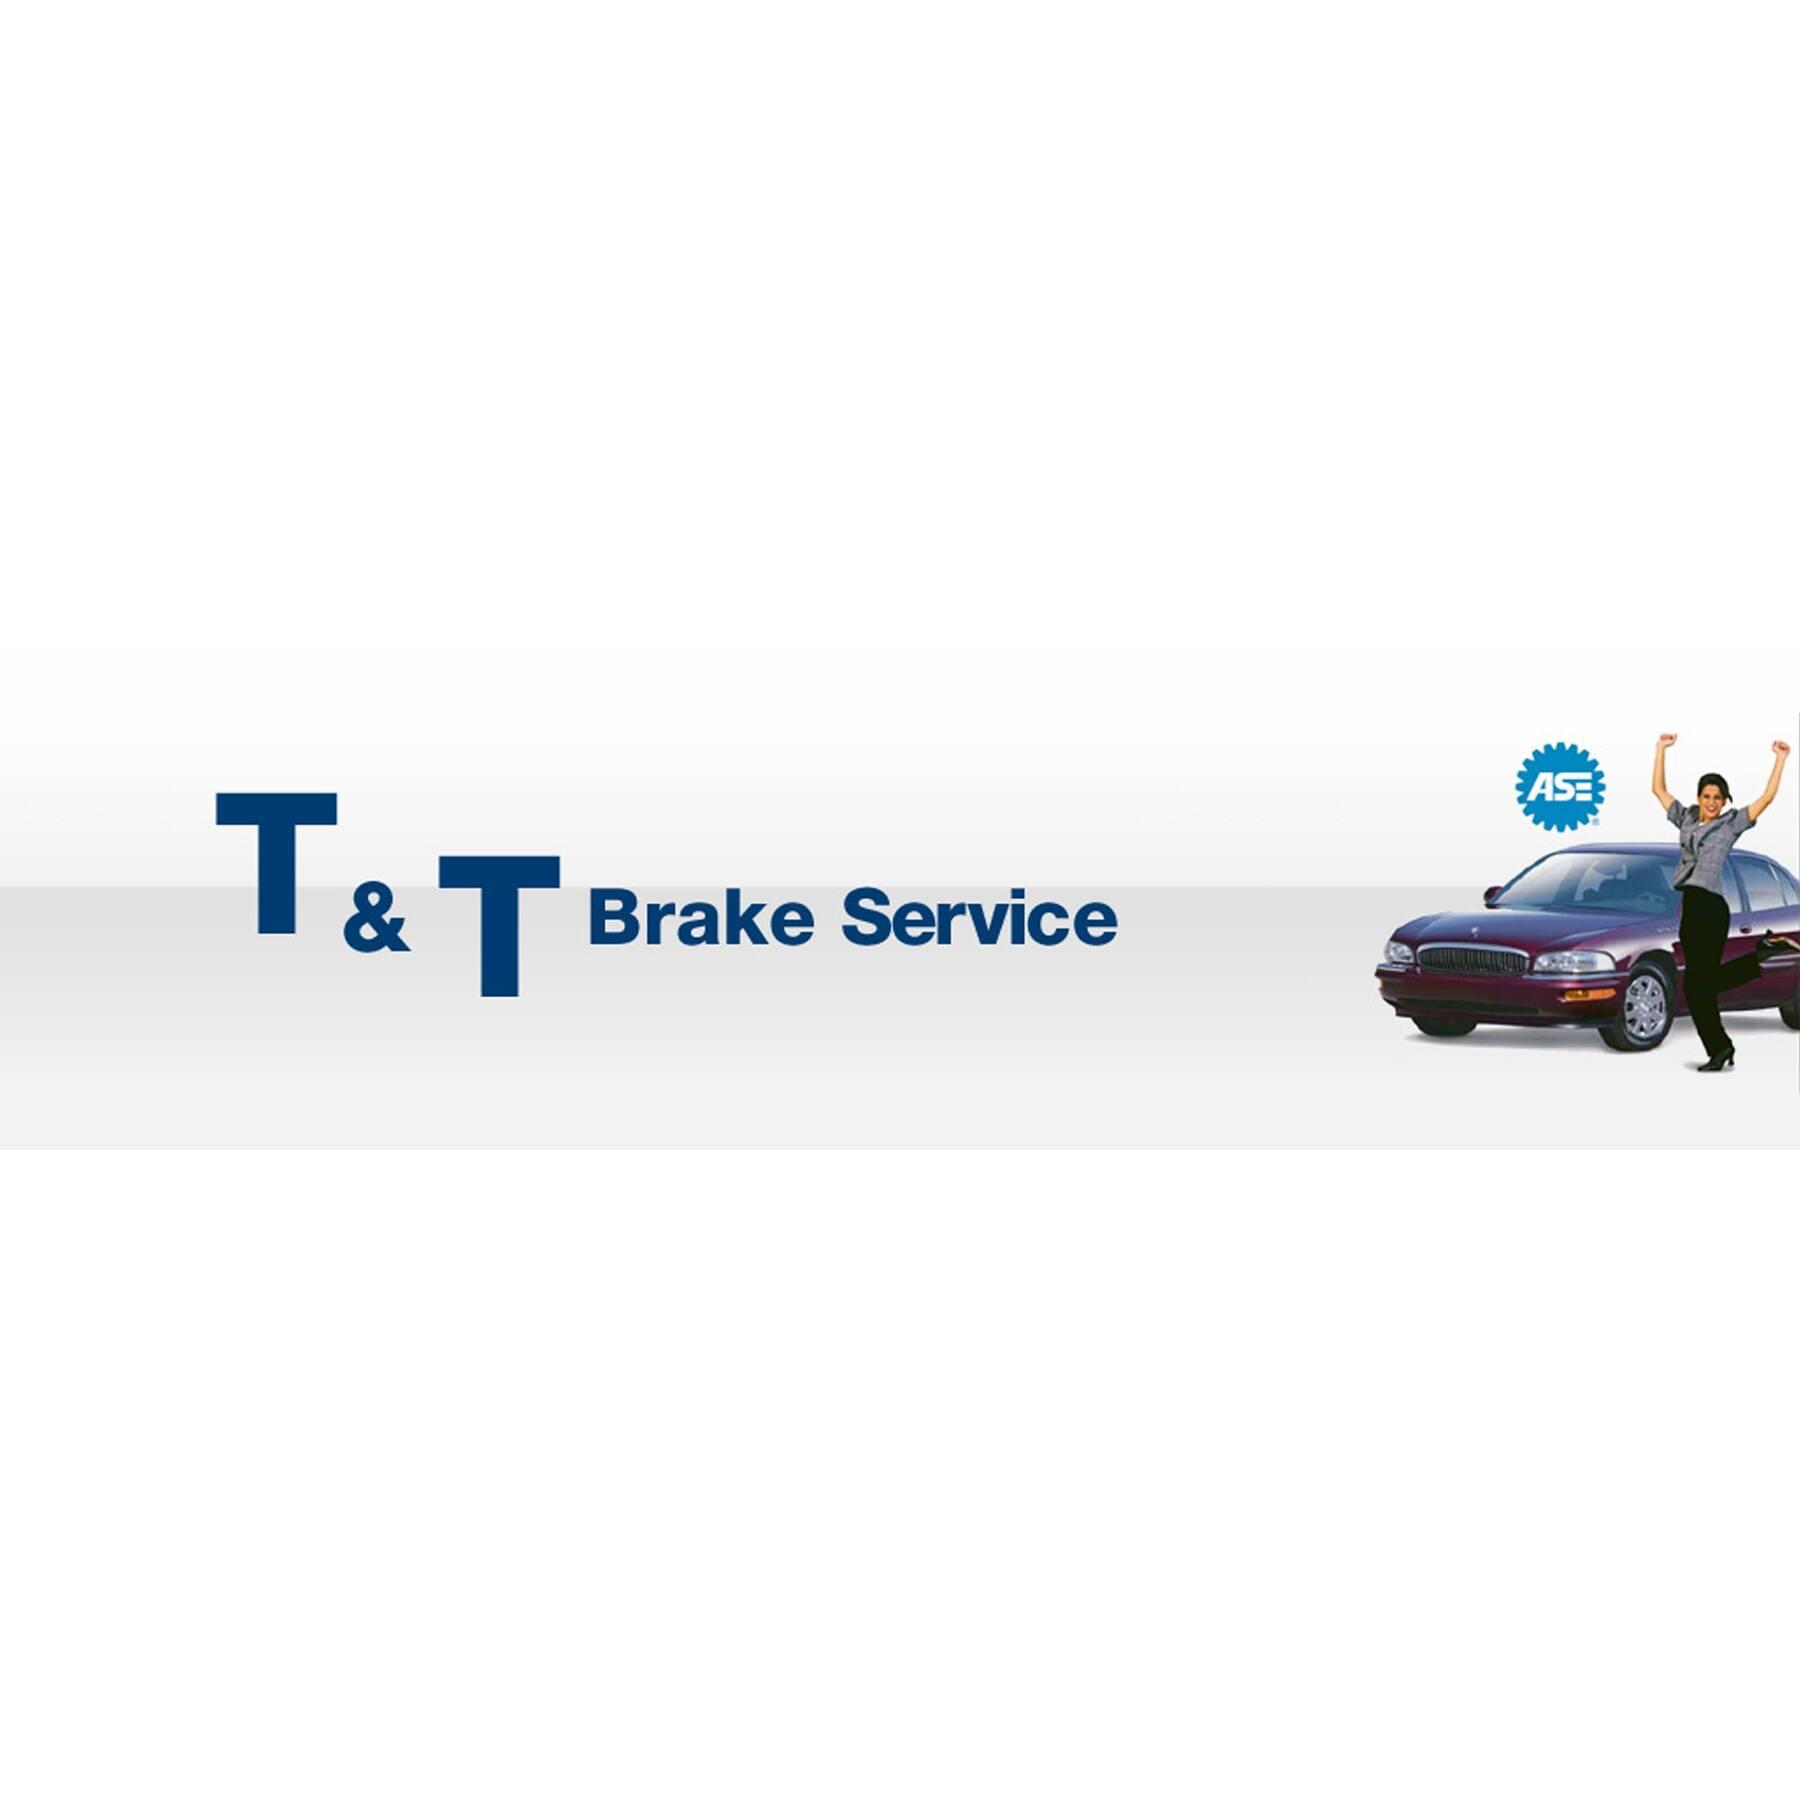 T&T Brake Service